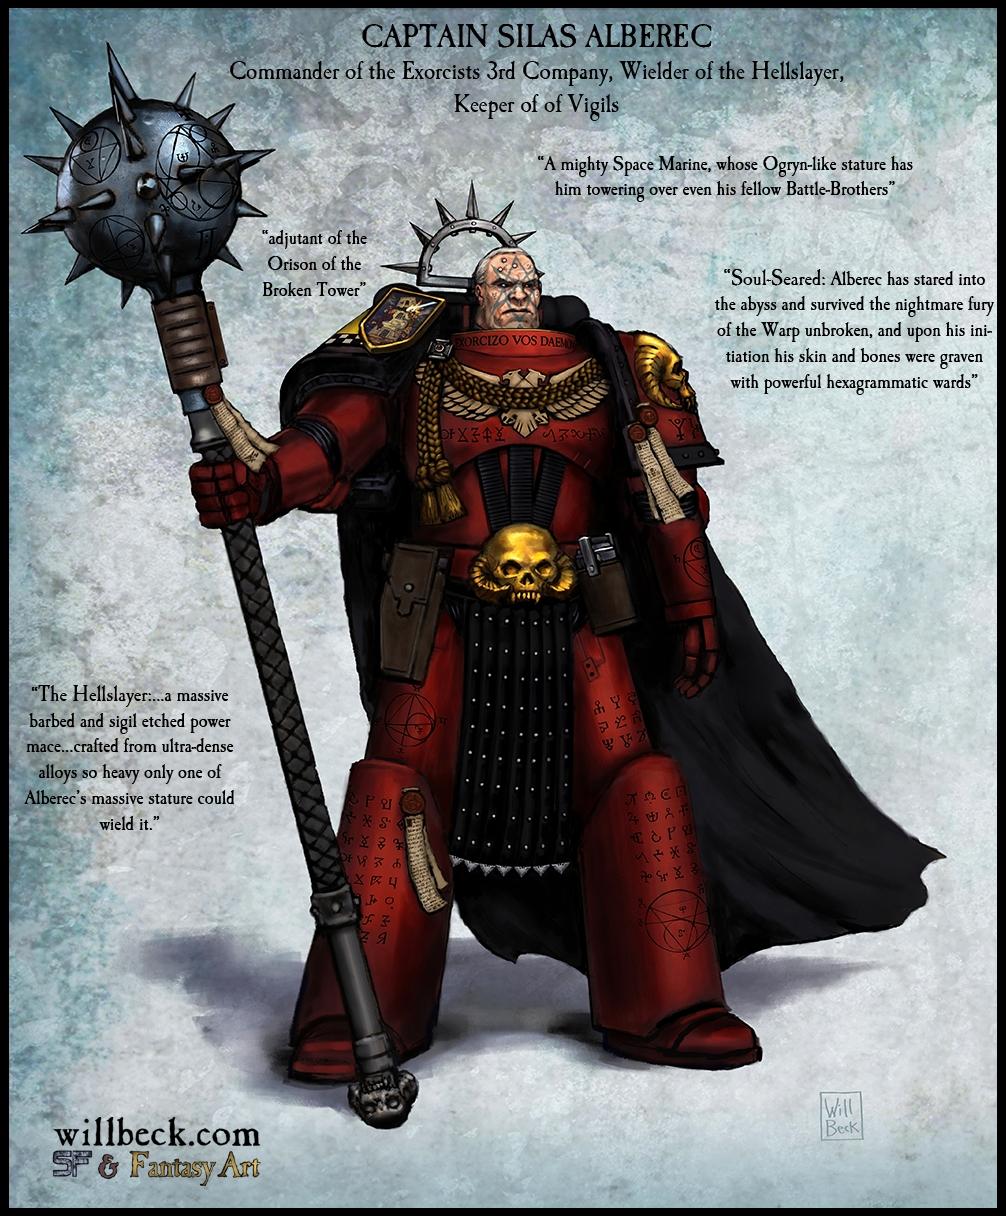 Silas Alberec Exorcists 3rd Company Captain